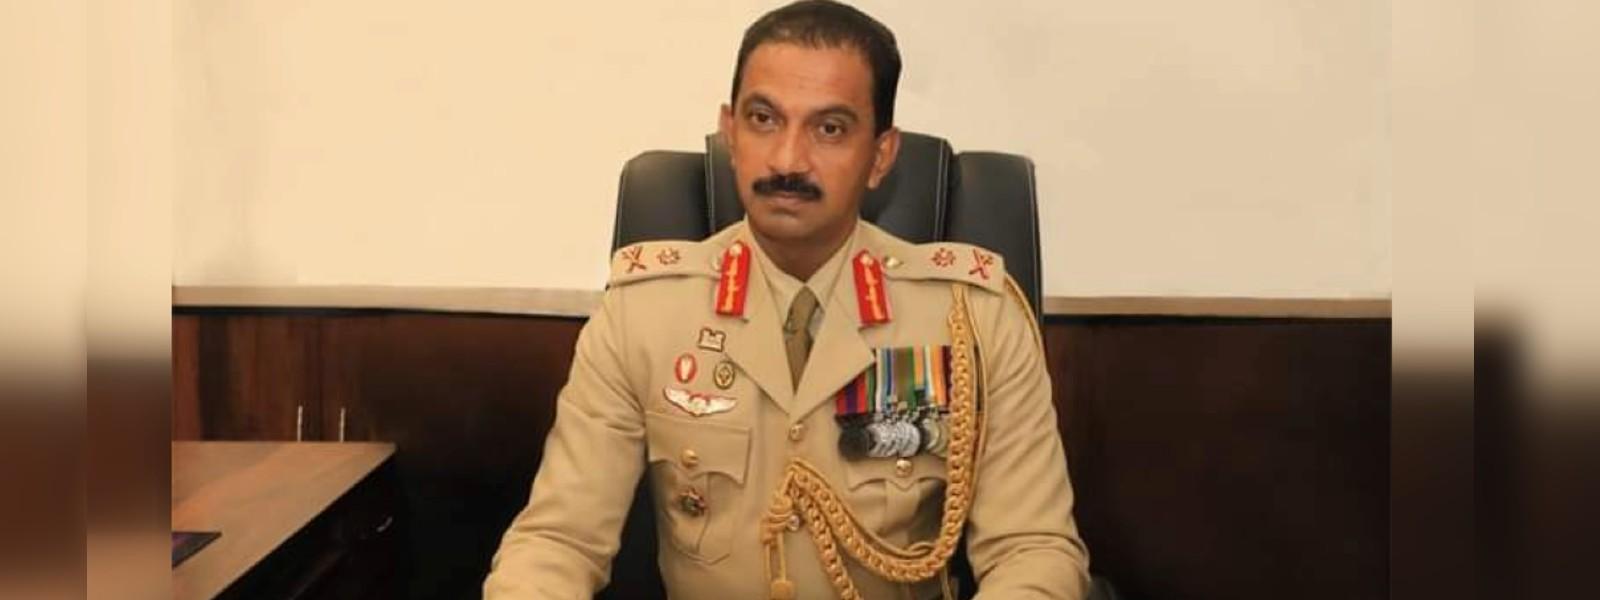 Maj. Gen. Jagath Gunawardena assumes duties as the new Chief of Staff of Army